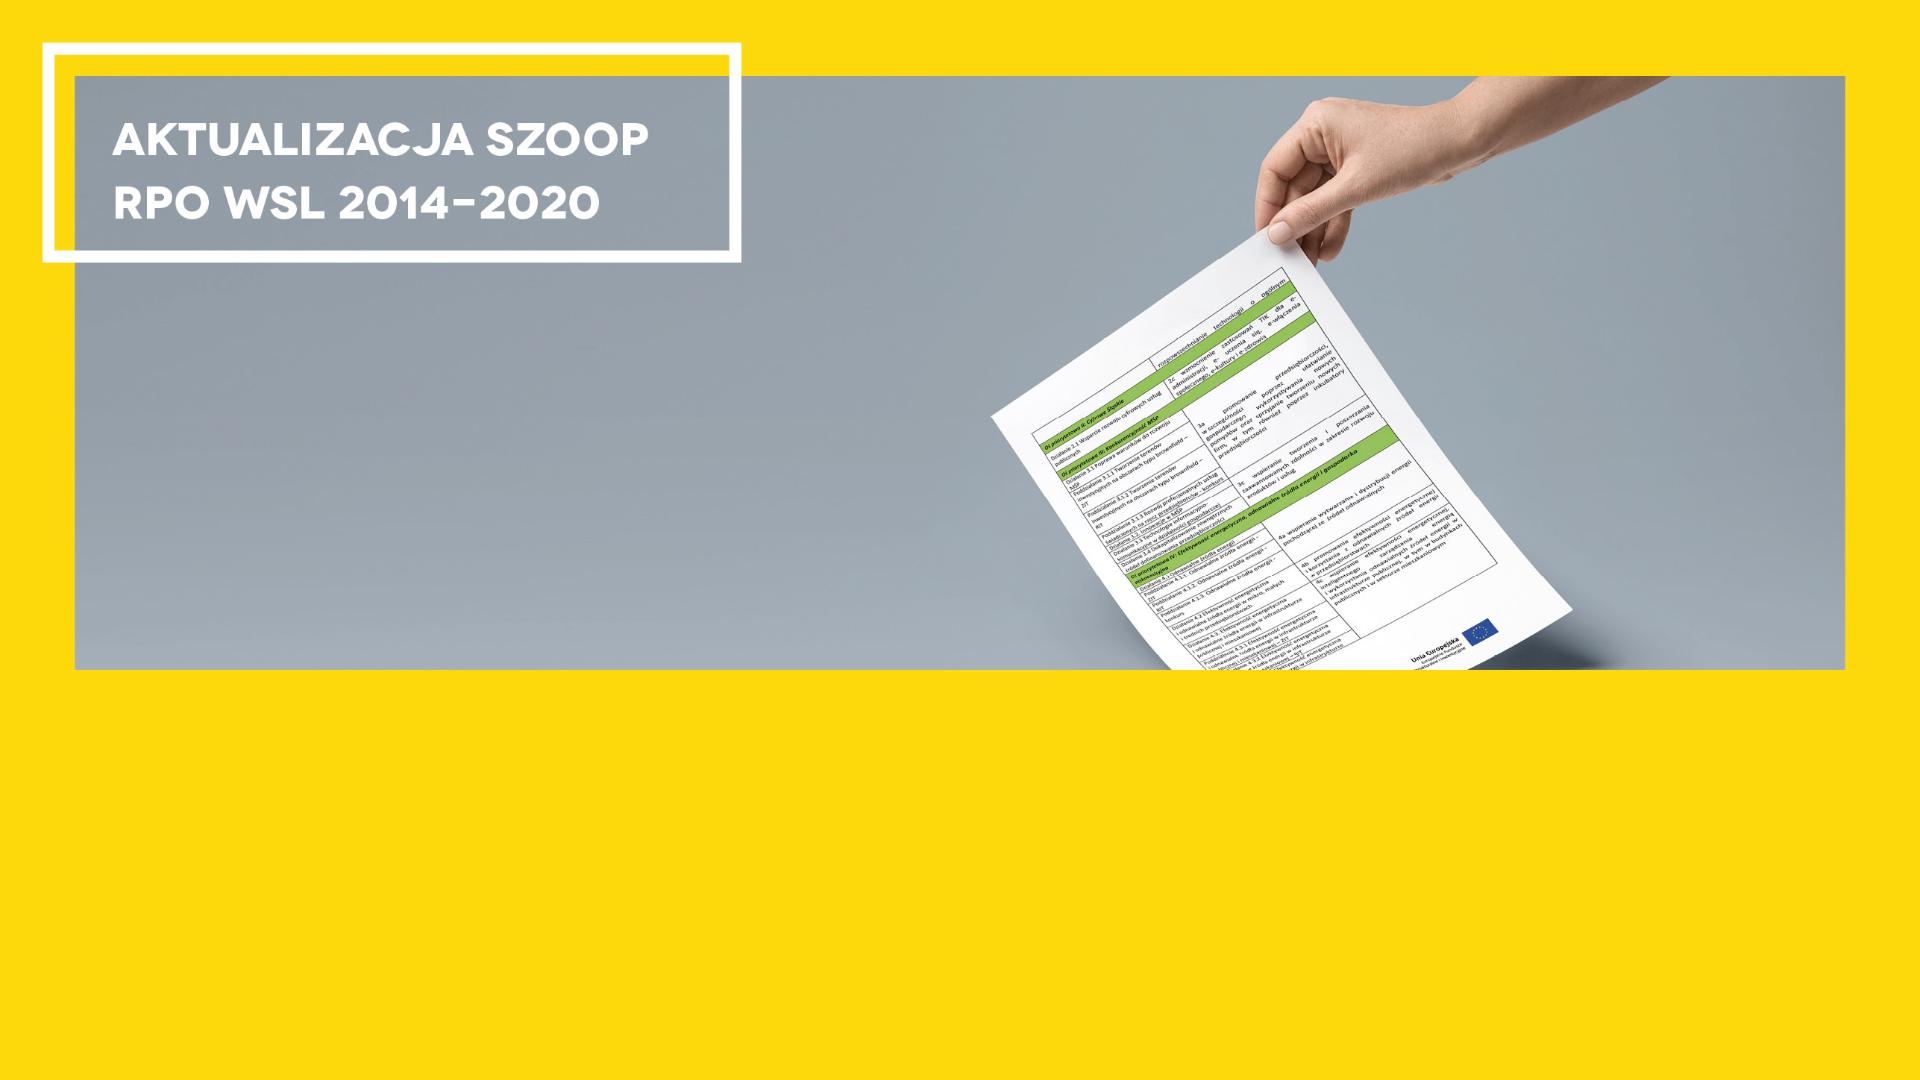 Aktualizacja SZOOP RPO WSL 2014-2020